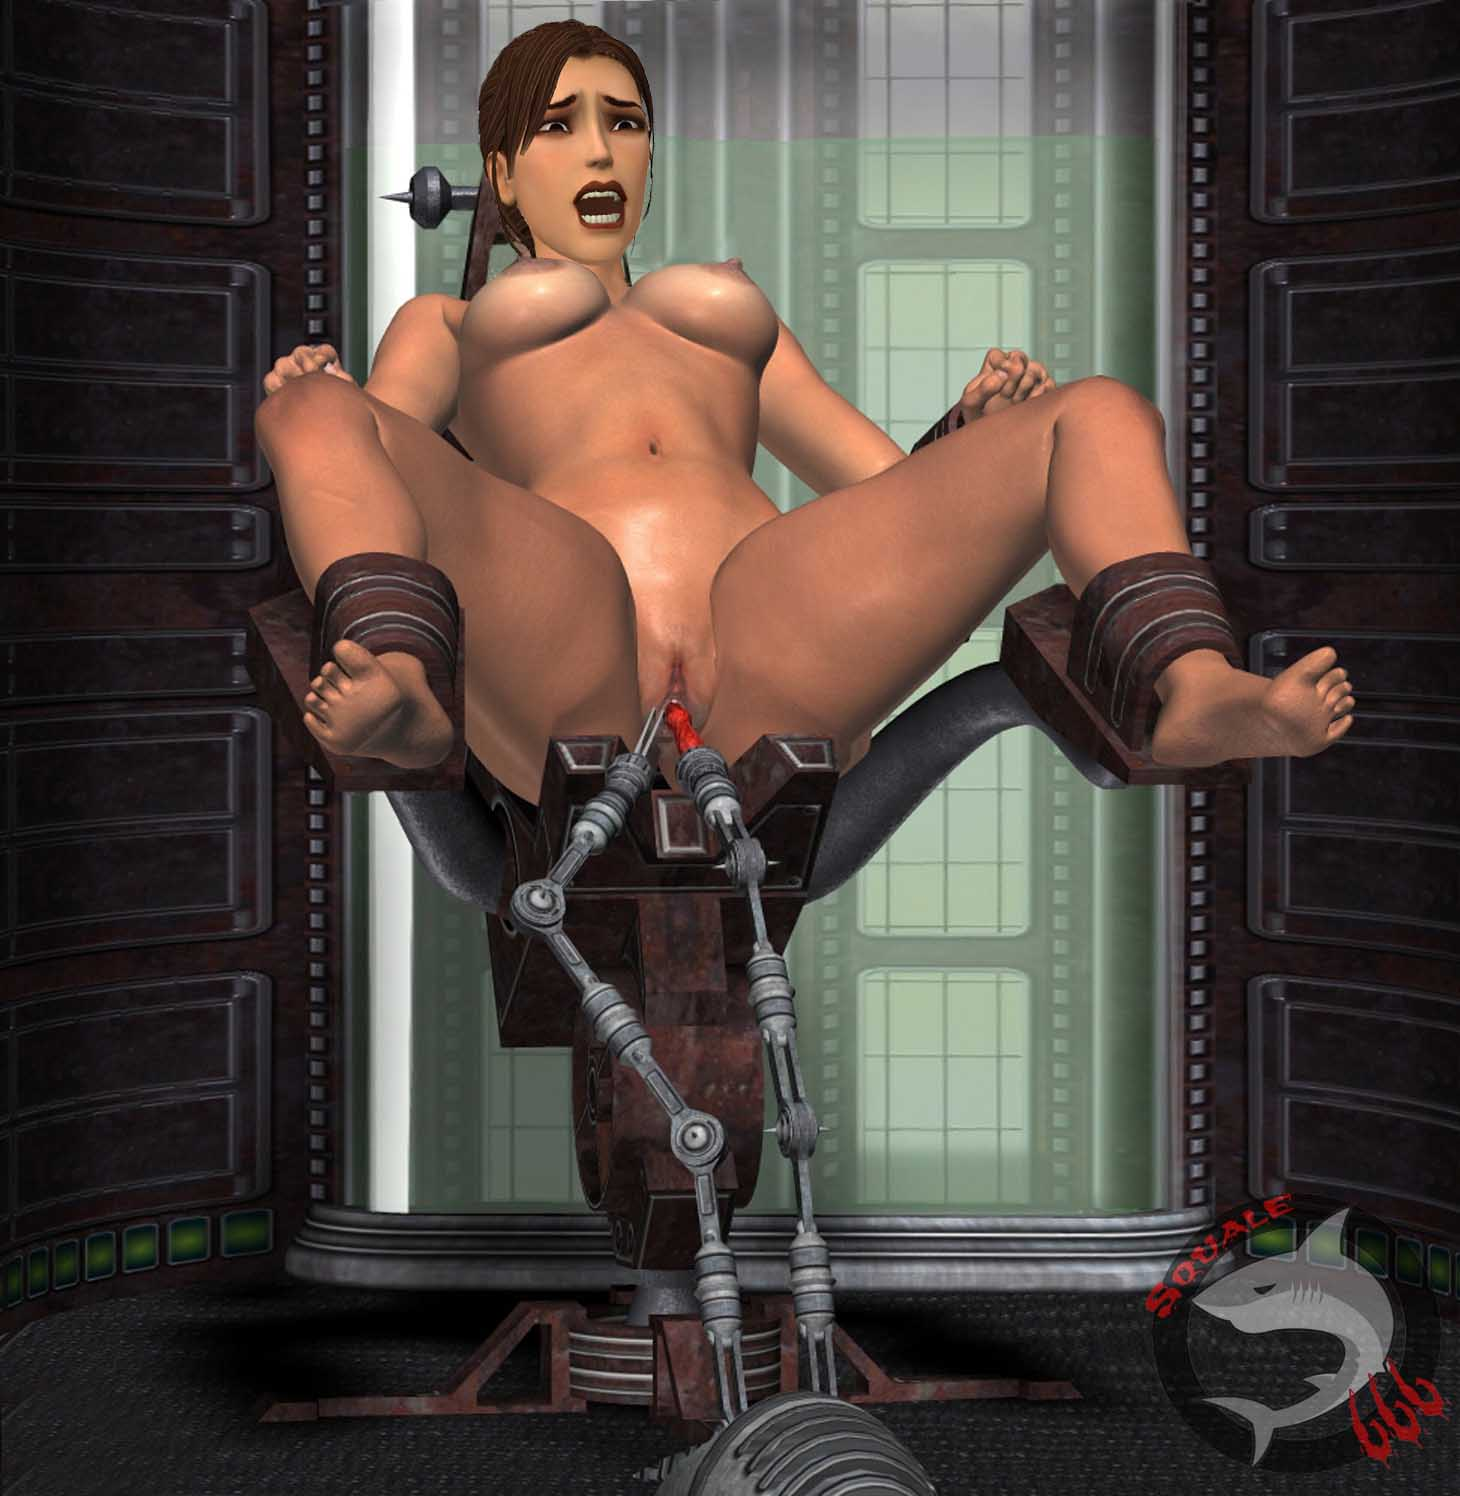 Tomb raider sex 3d 3gp erotica video